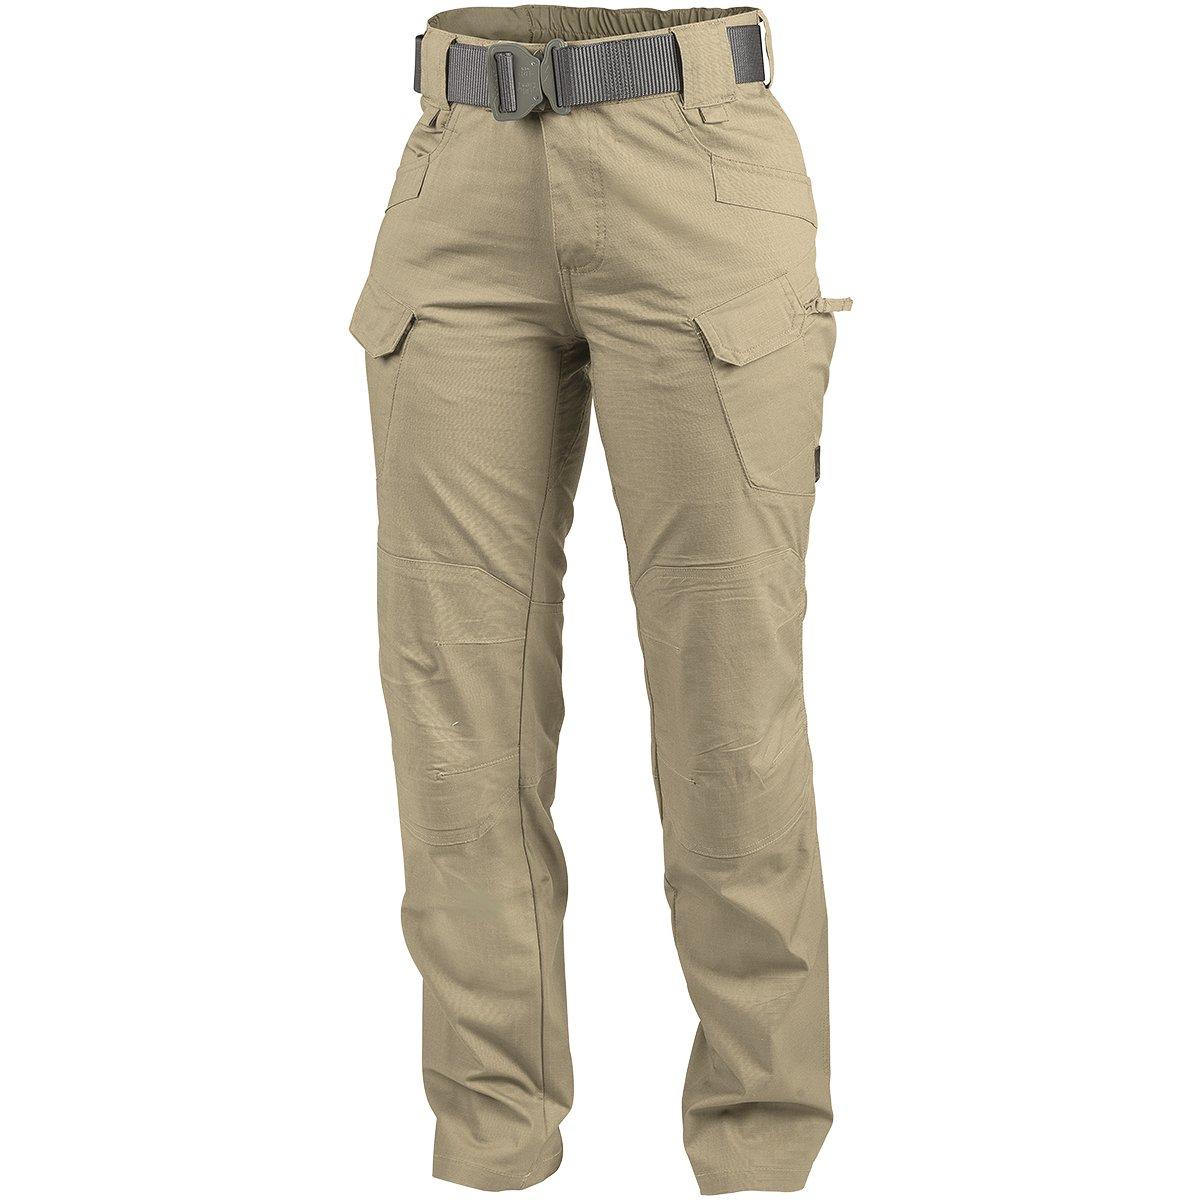 Helikon Women's UTP Trousers Khaki Polycotton Ripstop HELIKON-TEX